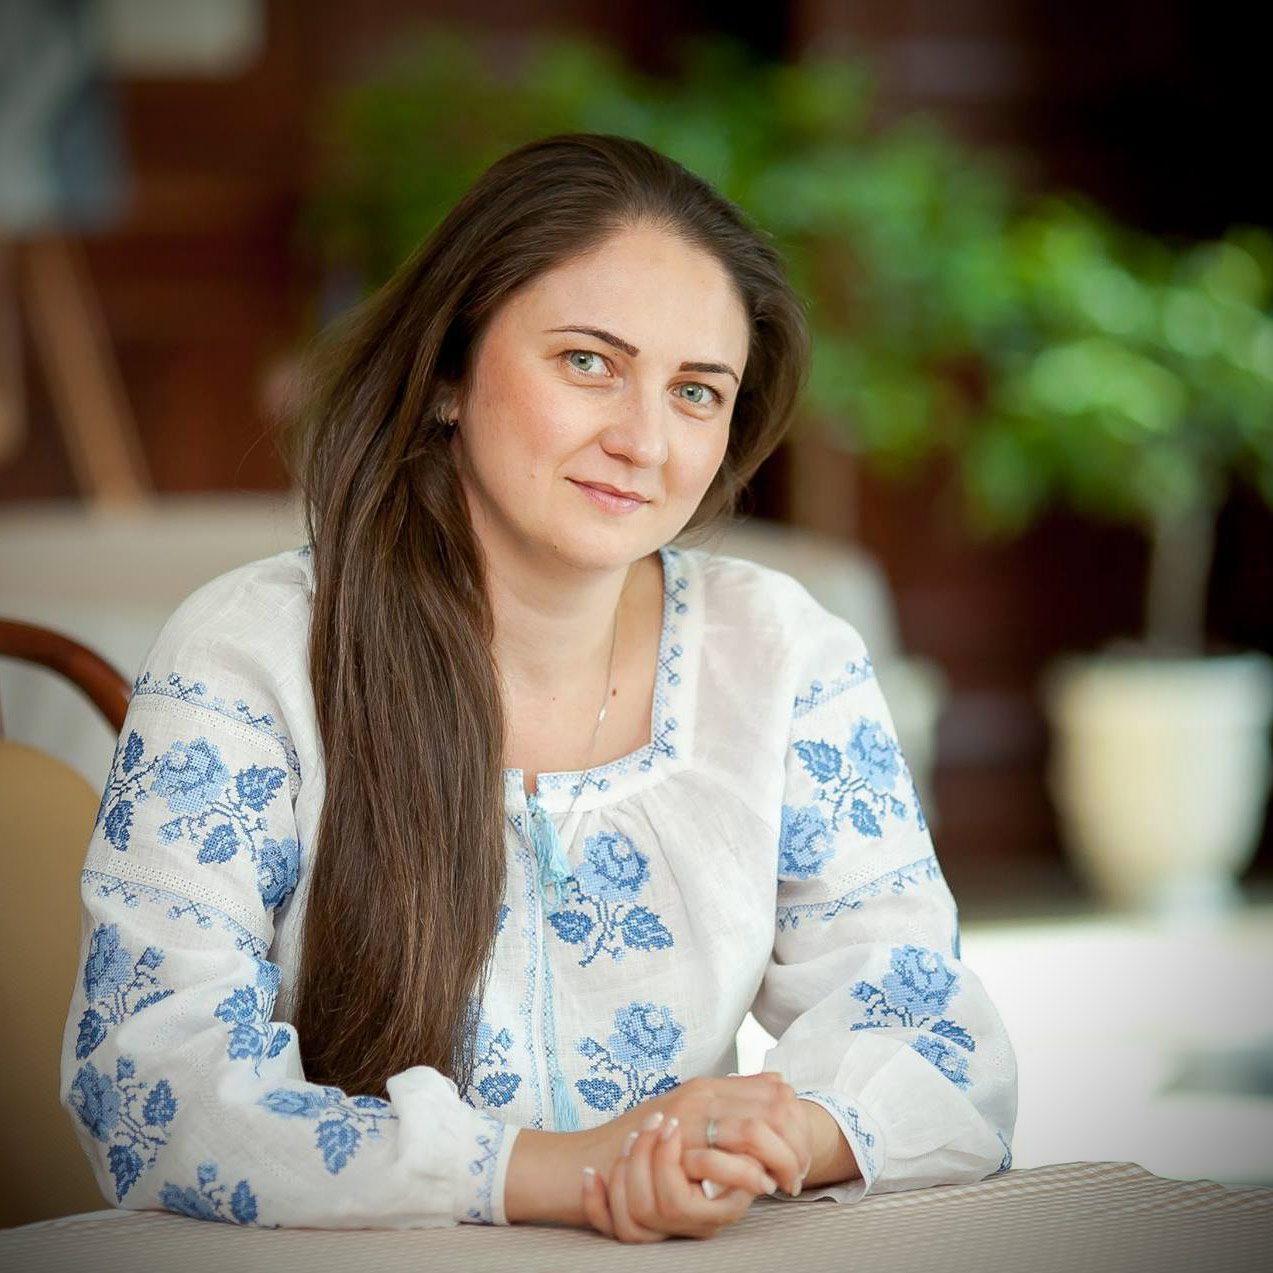 barynova - <b>Без сада и дома.</b> Почему в Украине постоянно исчезают села - Заборона